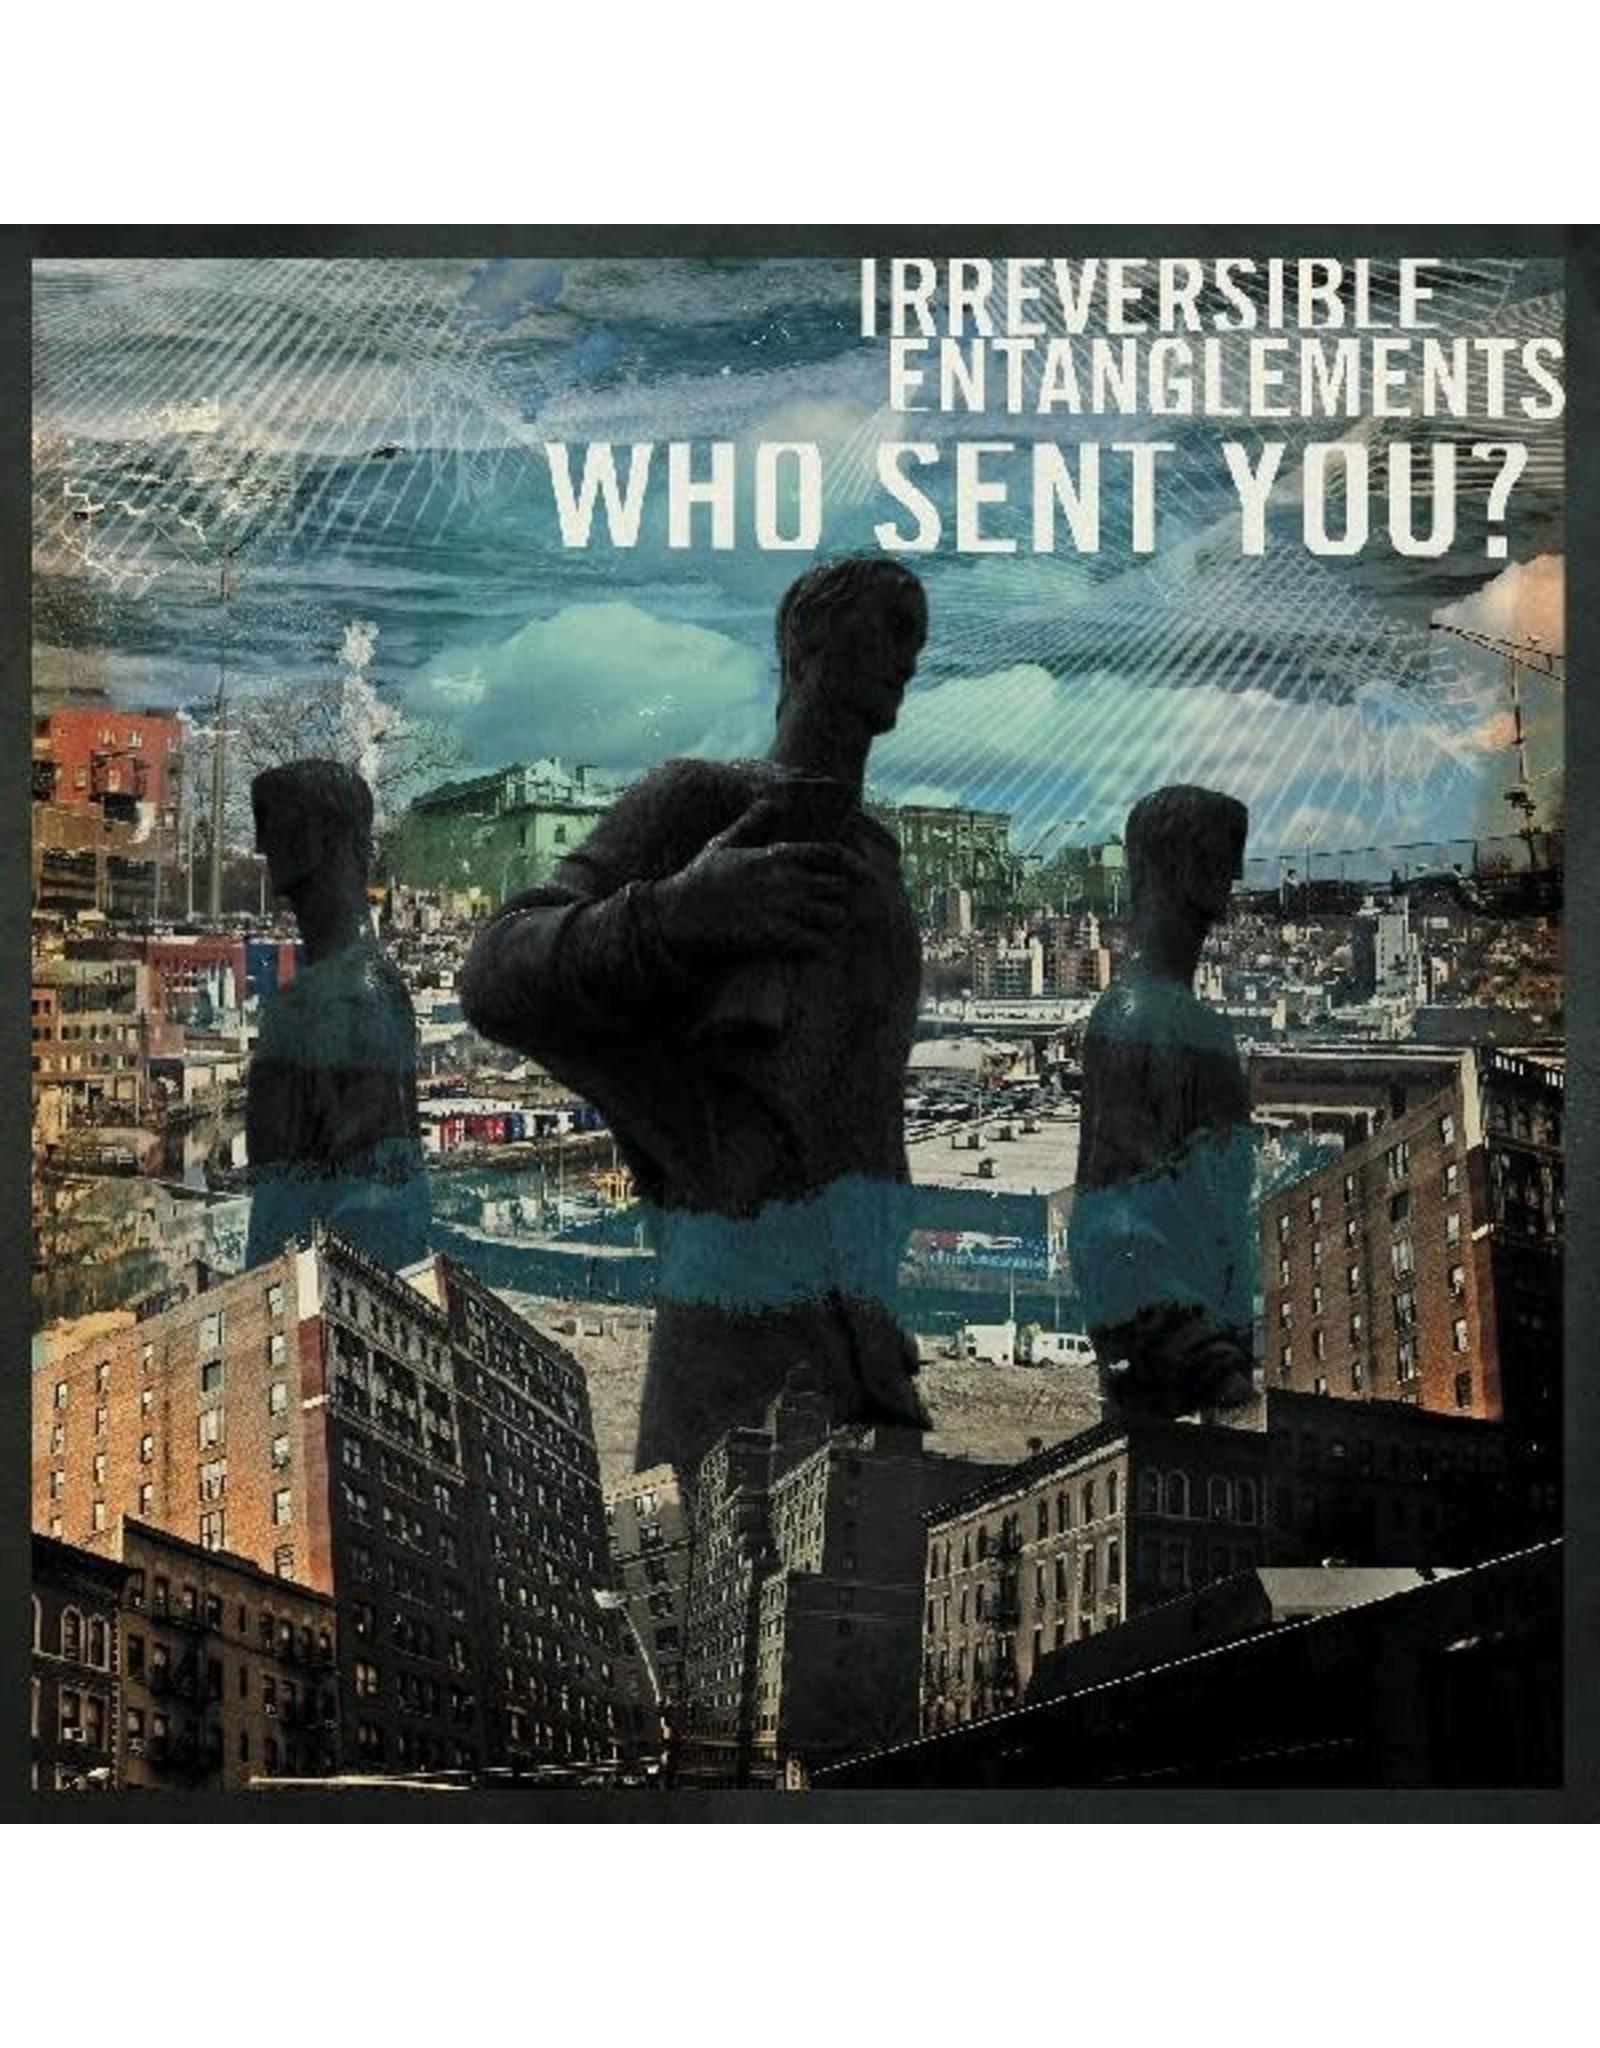 International Anthem Irreversible Entanglements: Who Sent You? LP